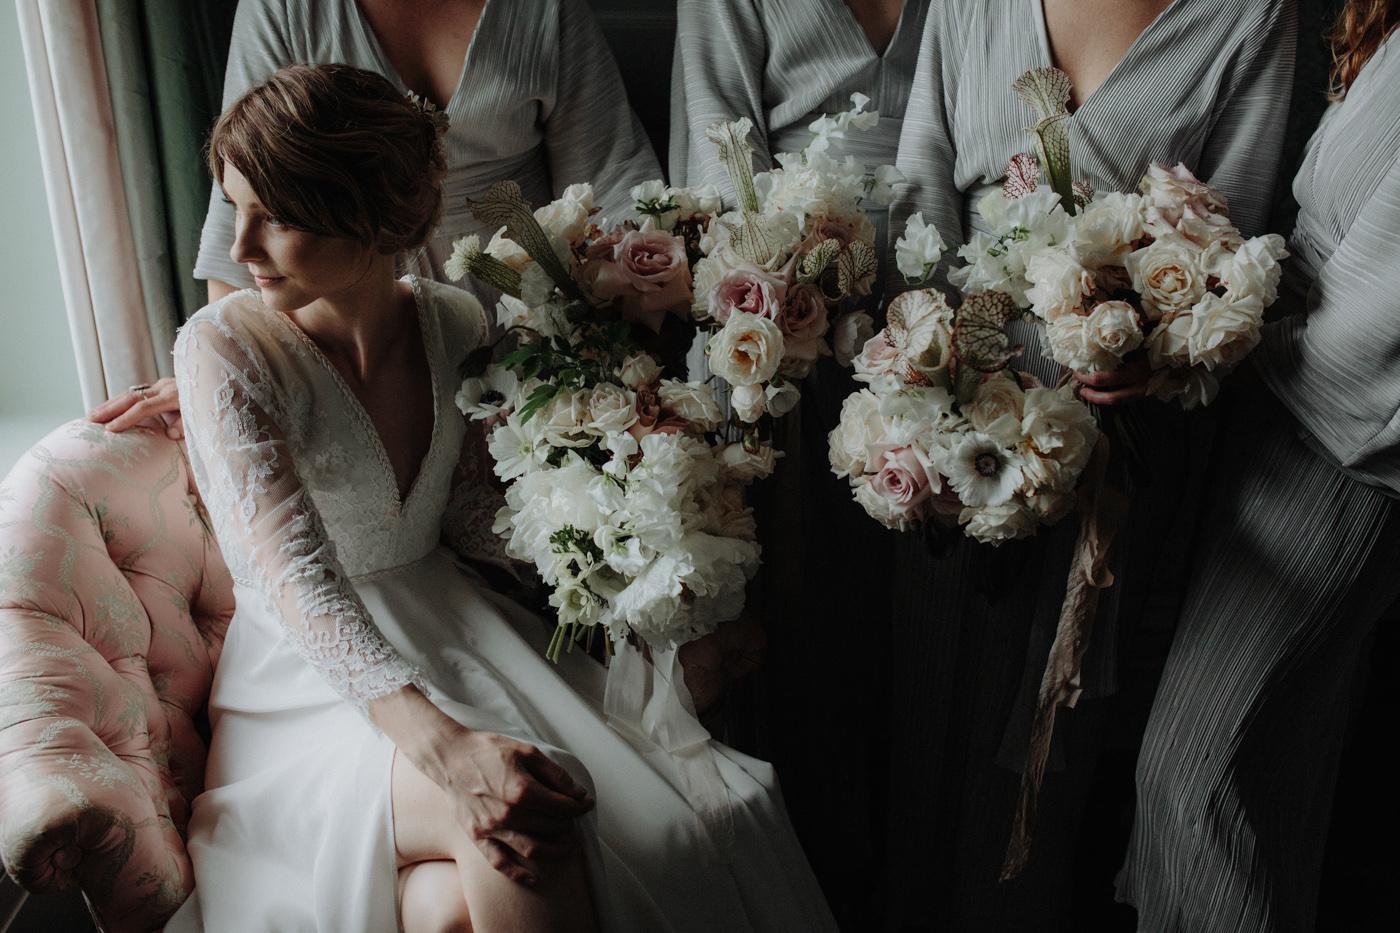 Erin-Mike-Intimate-Vintage-Wedding-Shelburne-Farms-Vermont -106.jpg